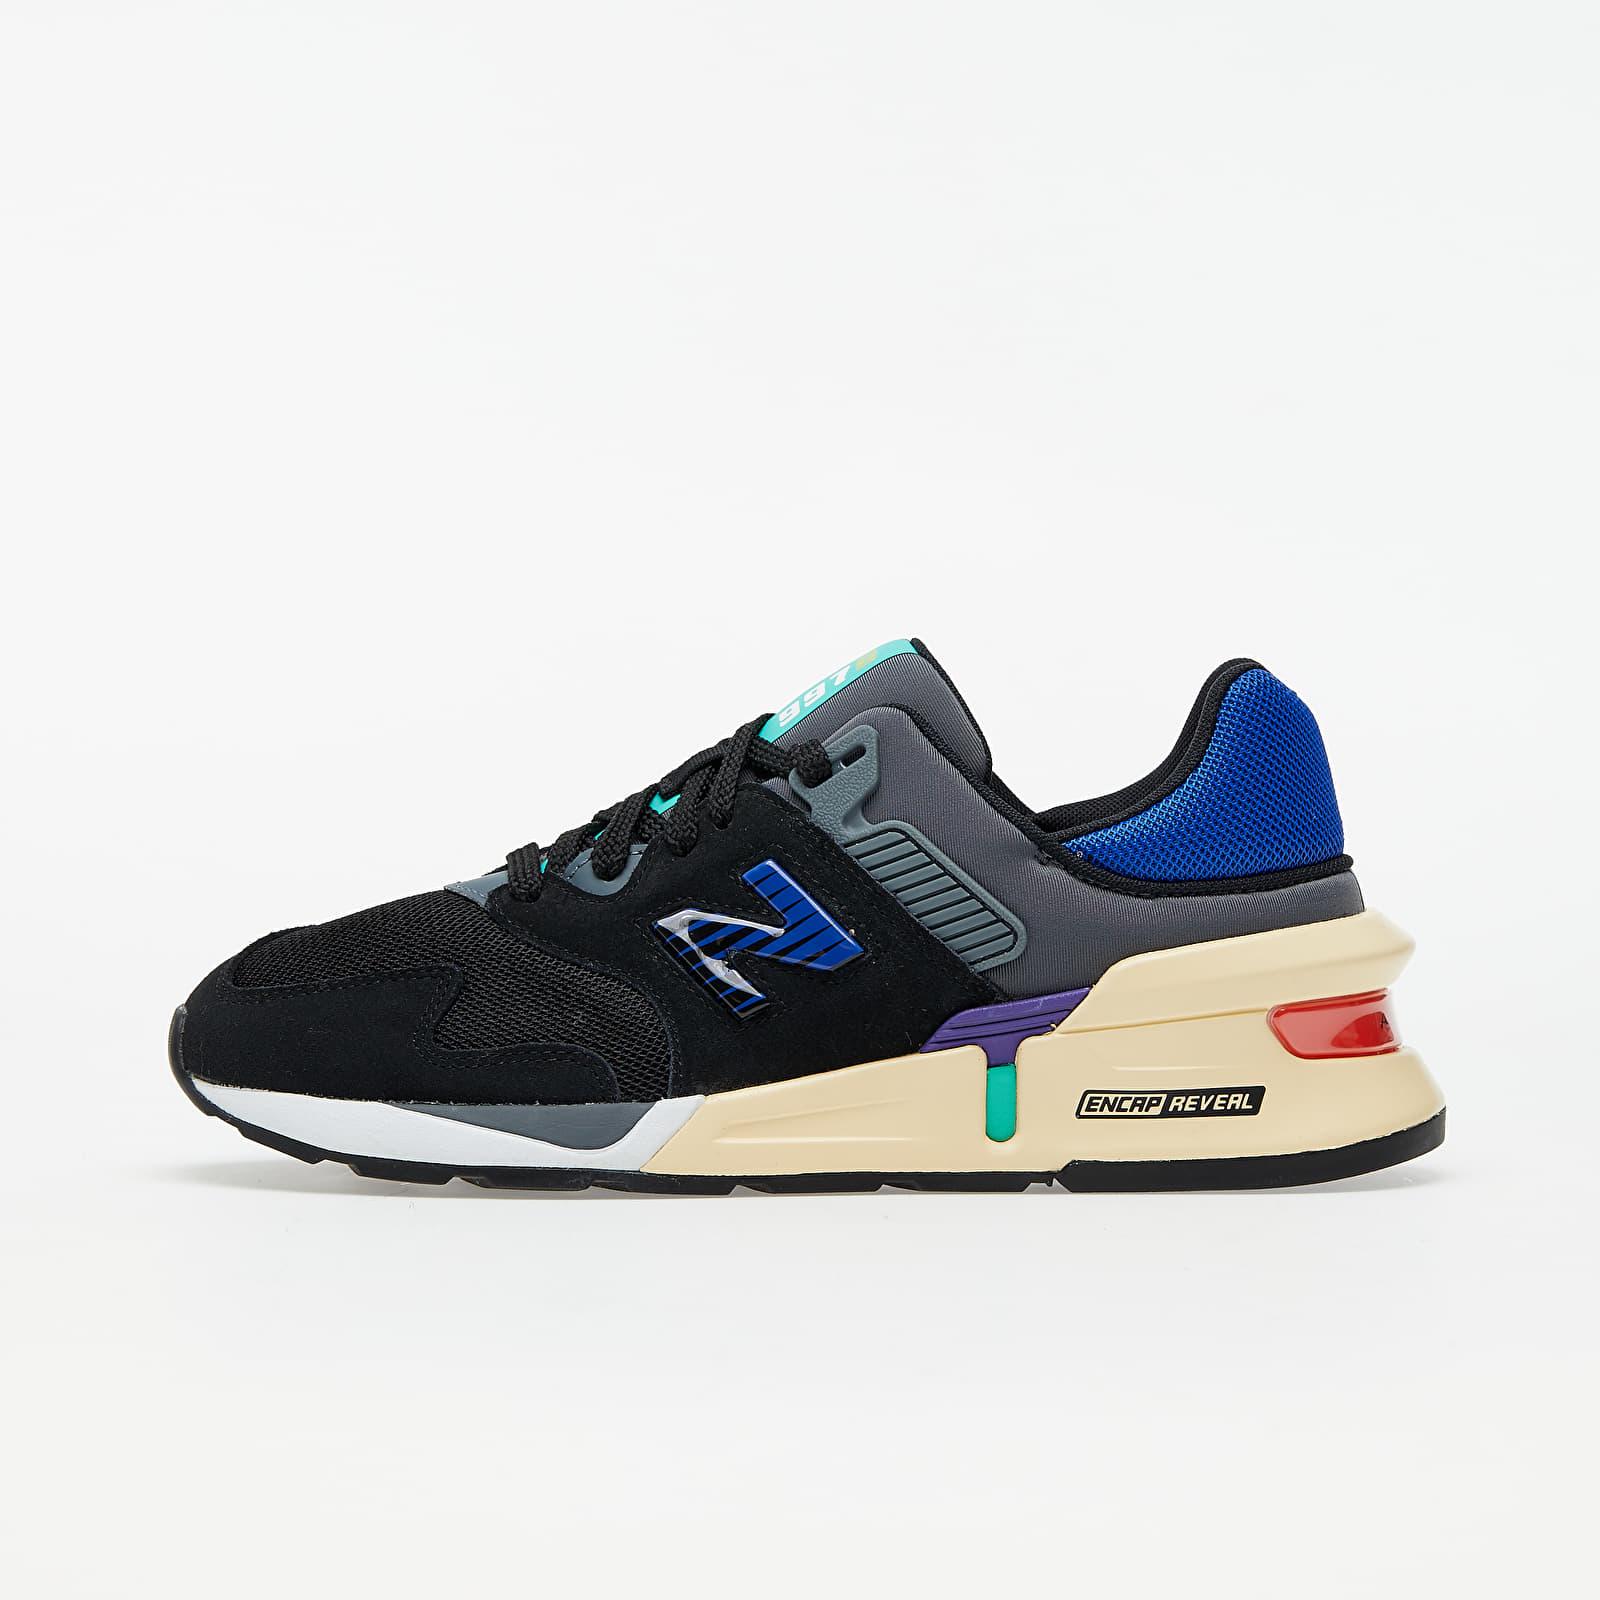 New Balance 997 Black EUR 42.5